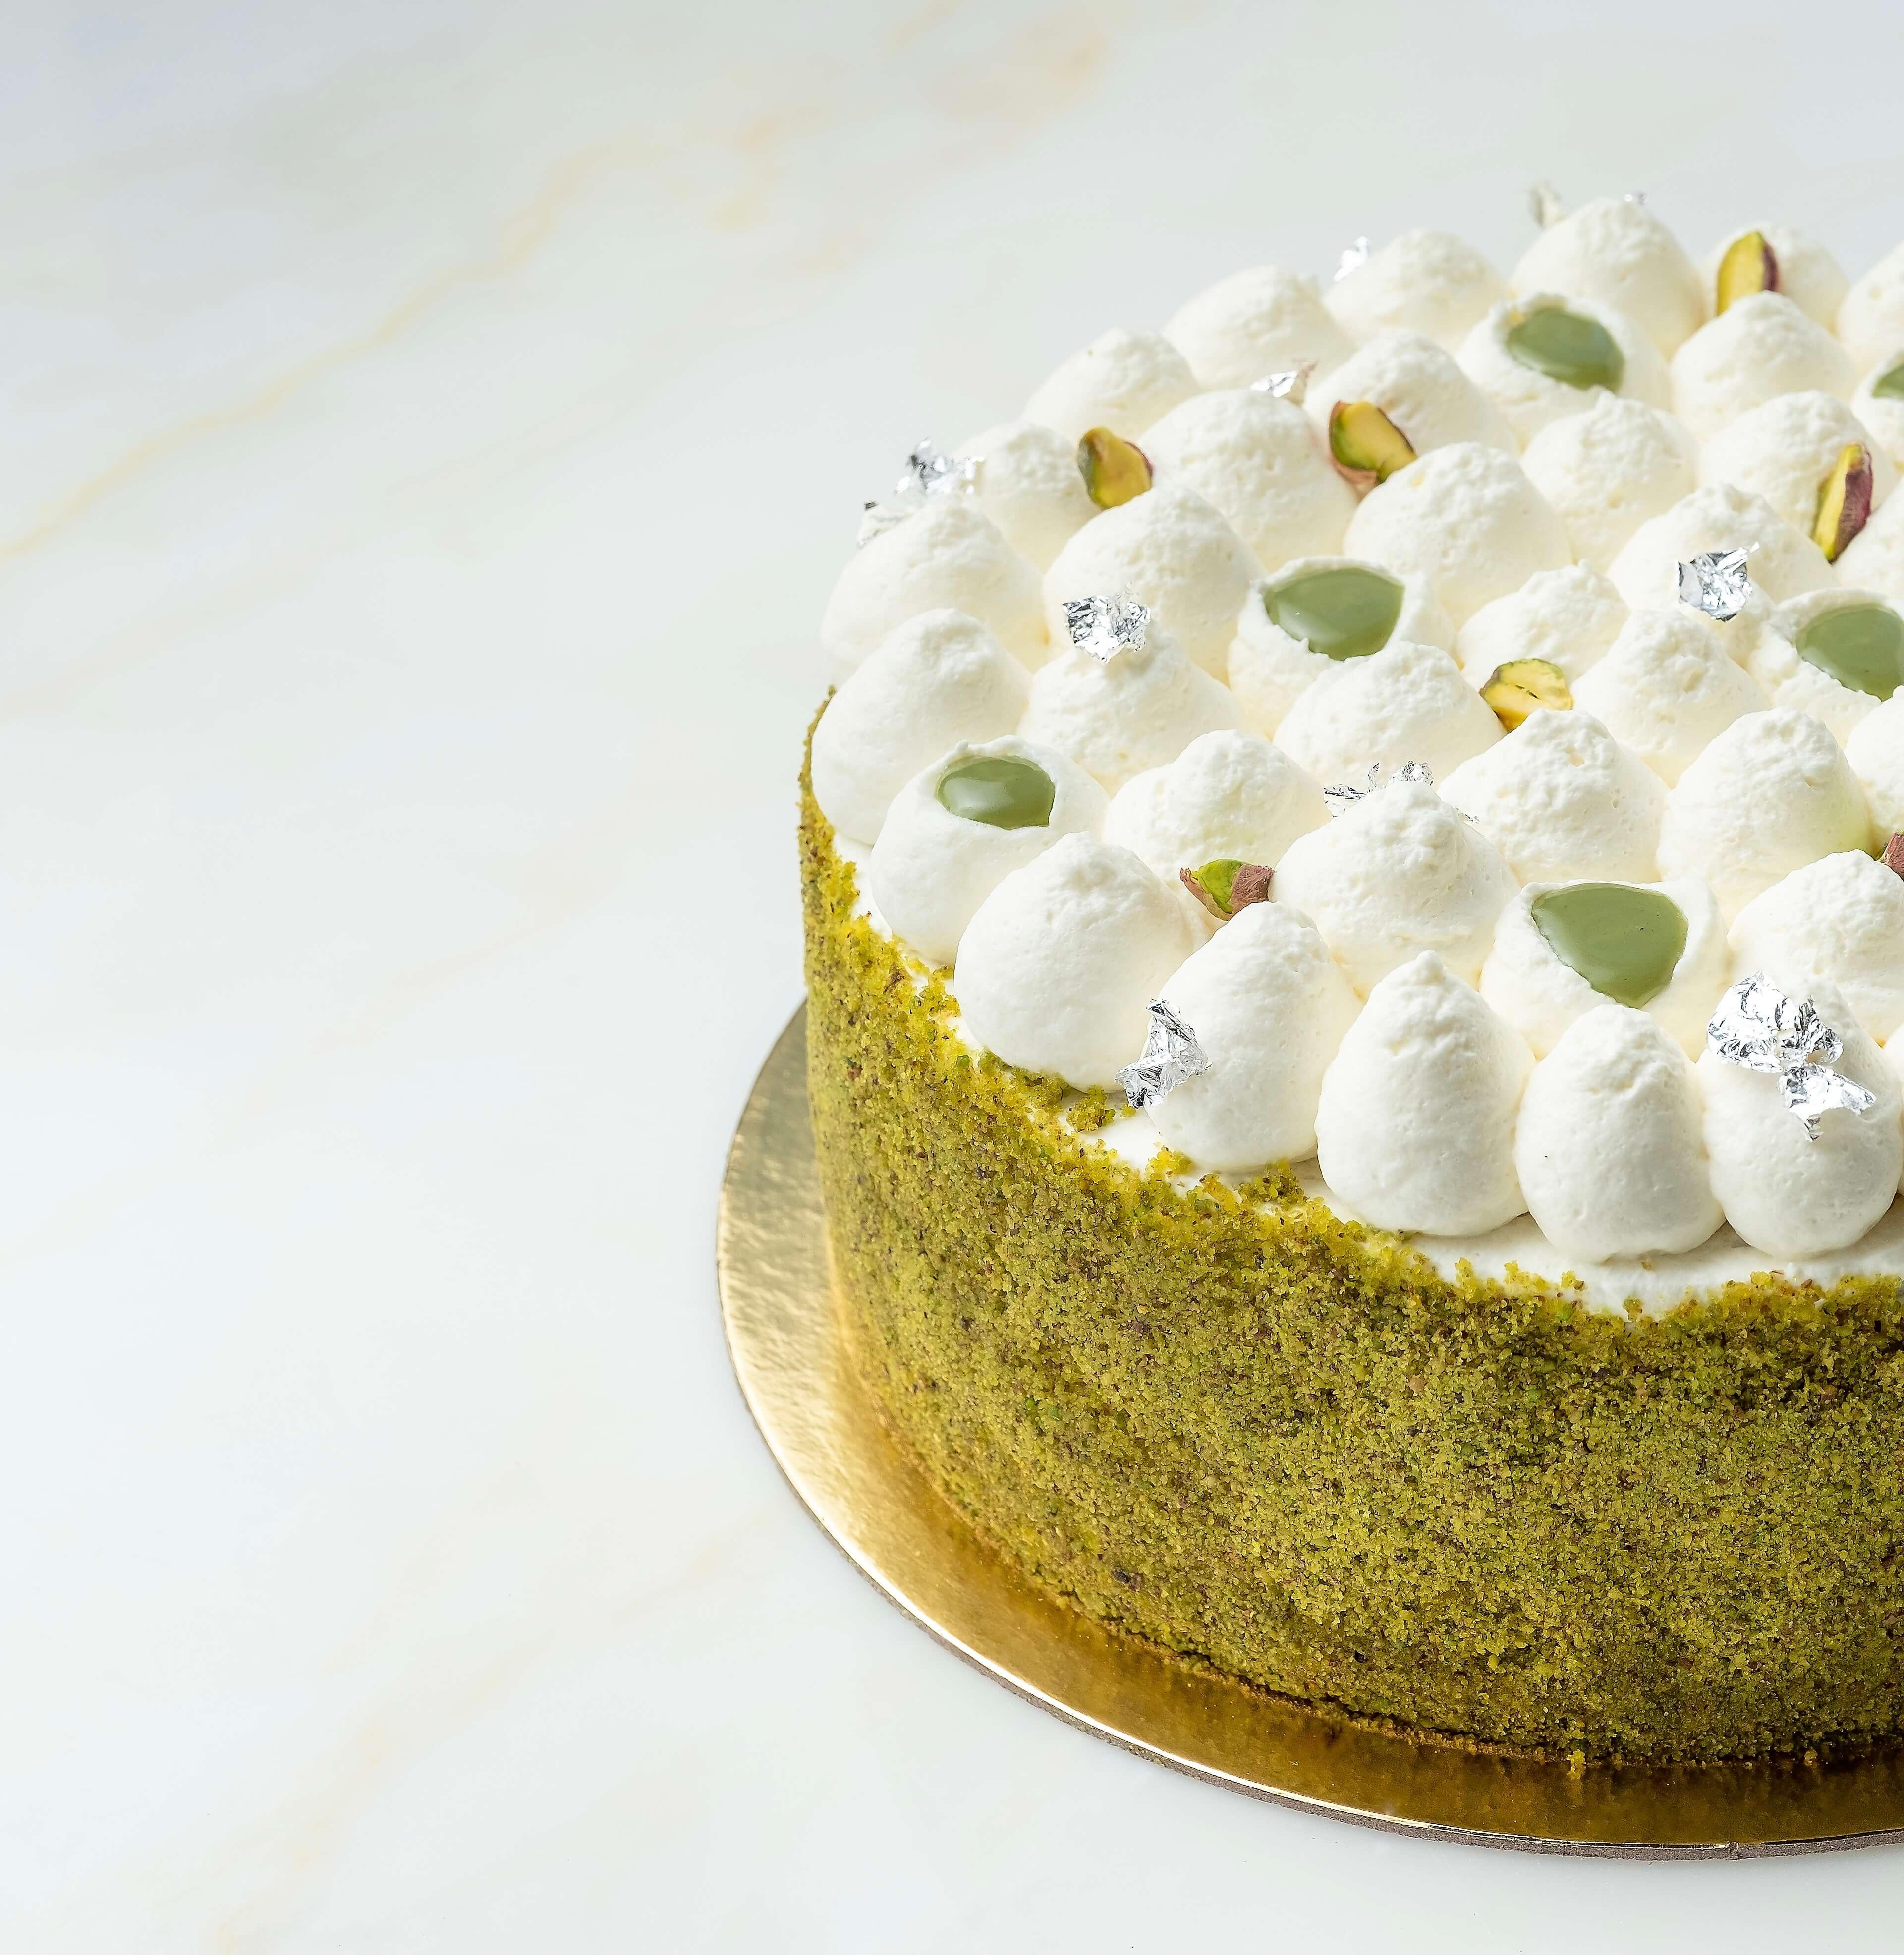 Pistachio Rahash cake